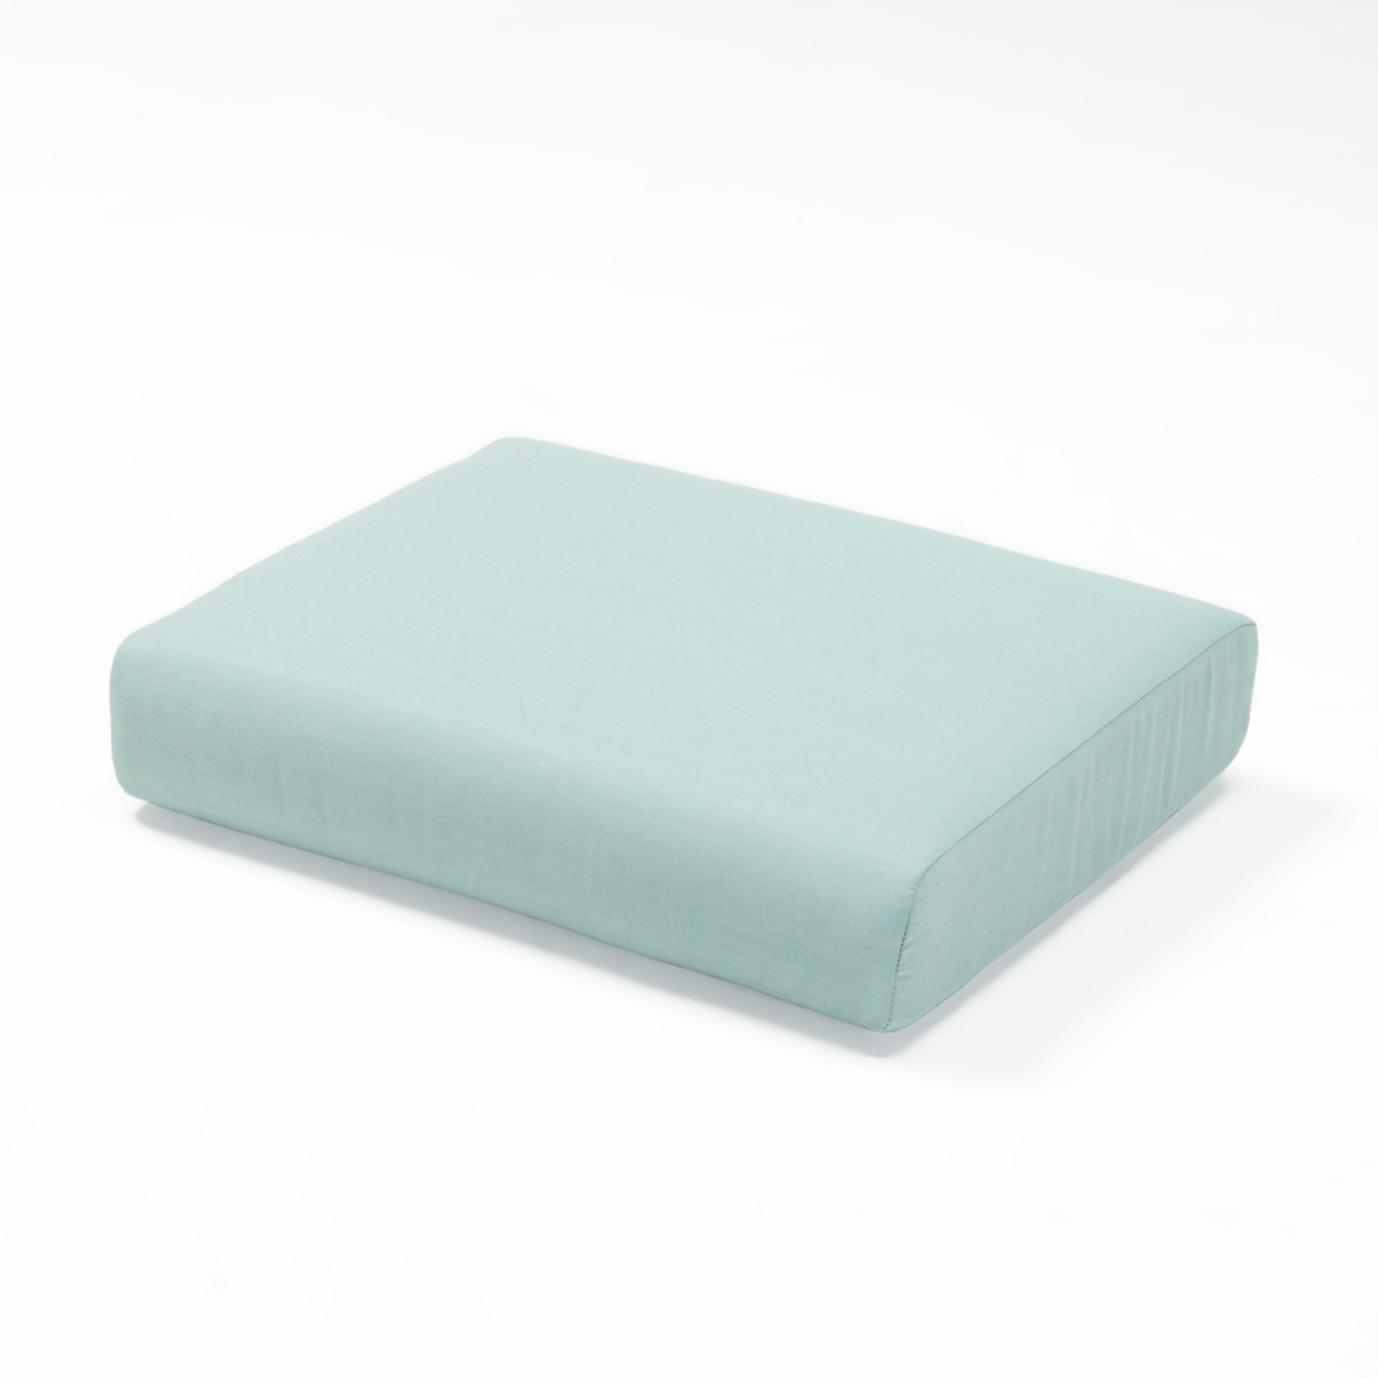 Portofino Casual Club Ottoman Cushion - Spa Blue